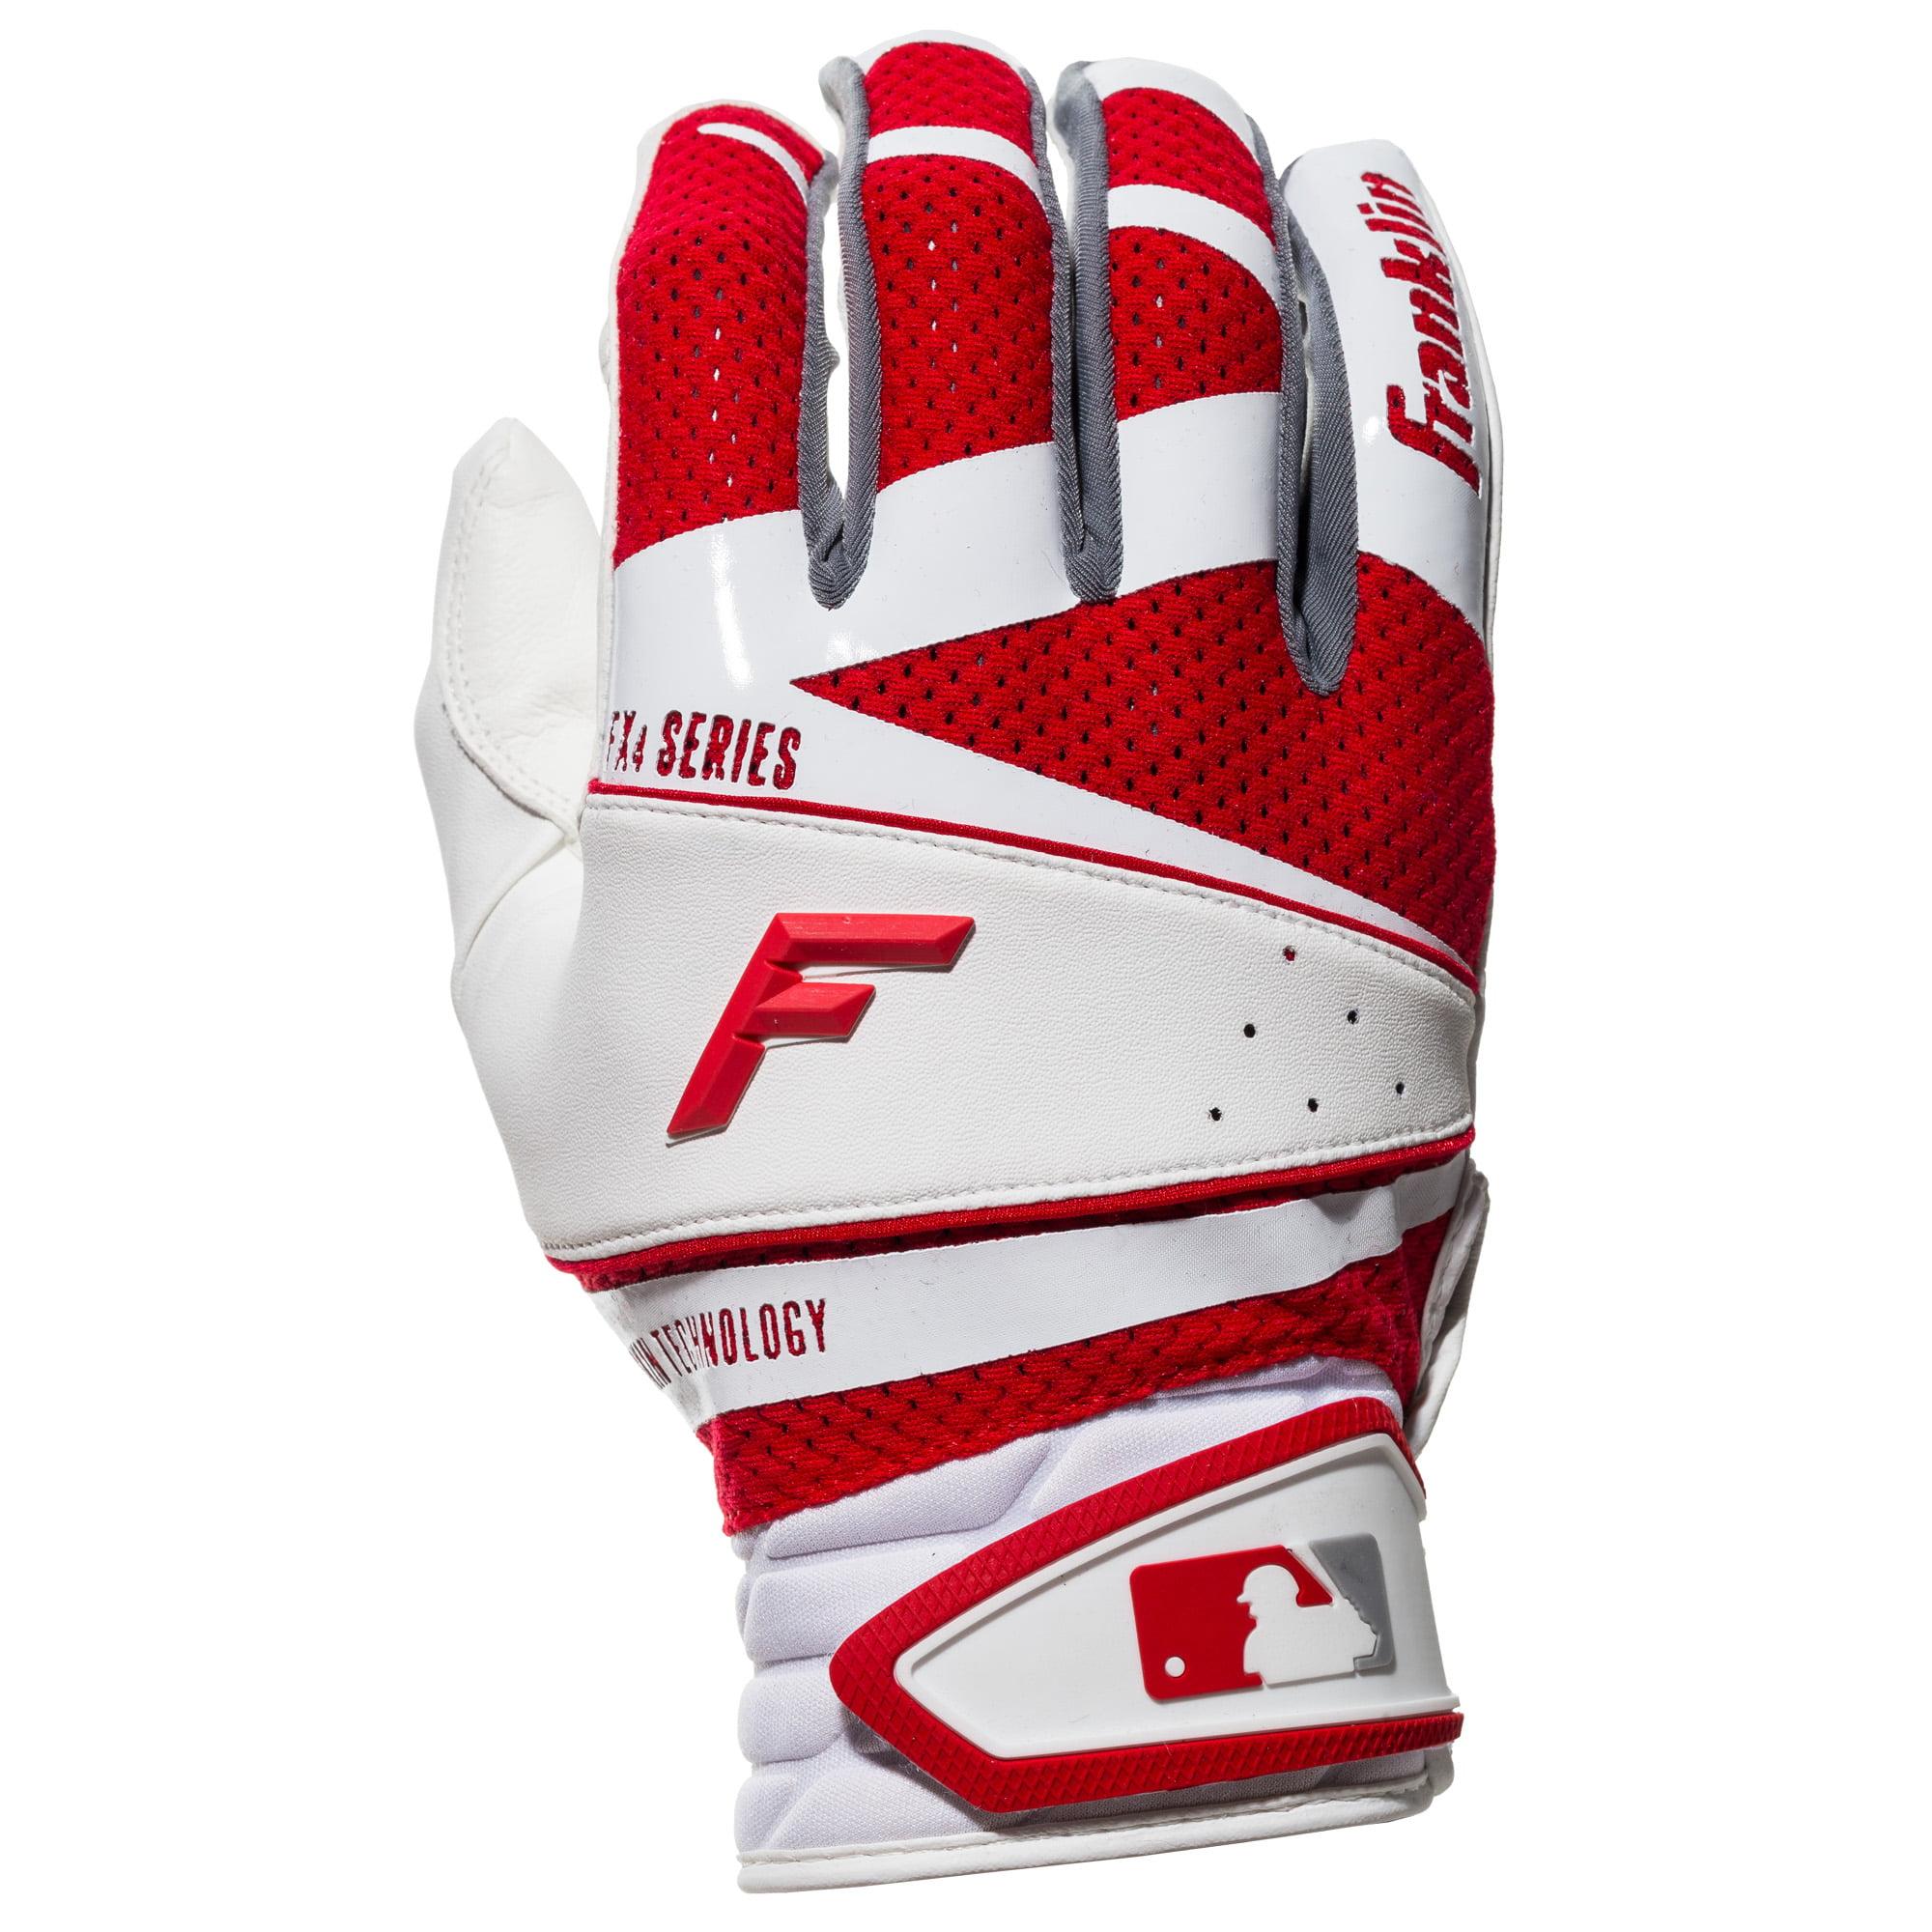 Franklin Sports MLB Freeflex Pro Series Batting Gloves by Franklin Sports